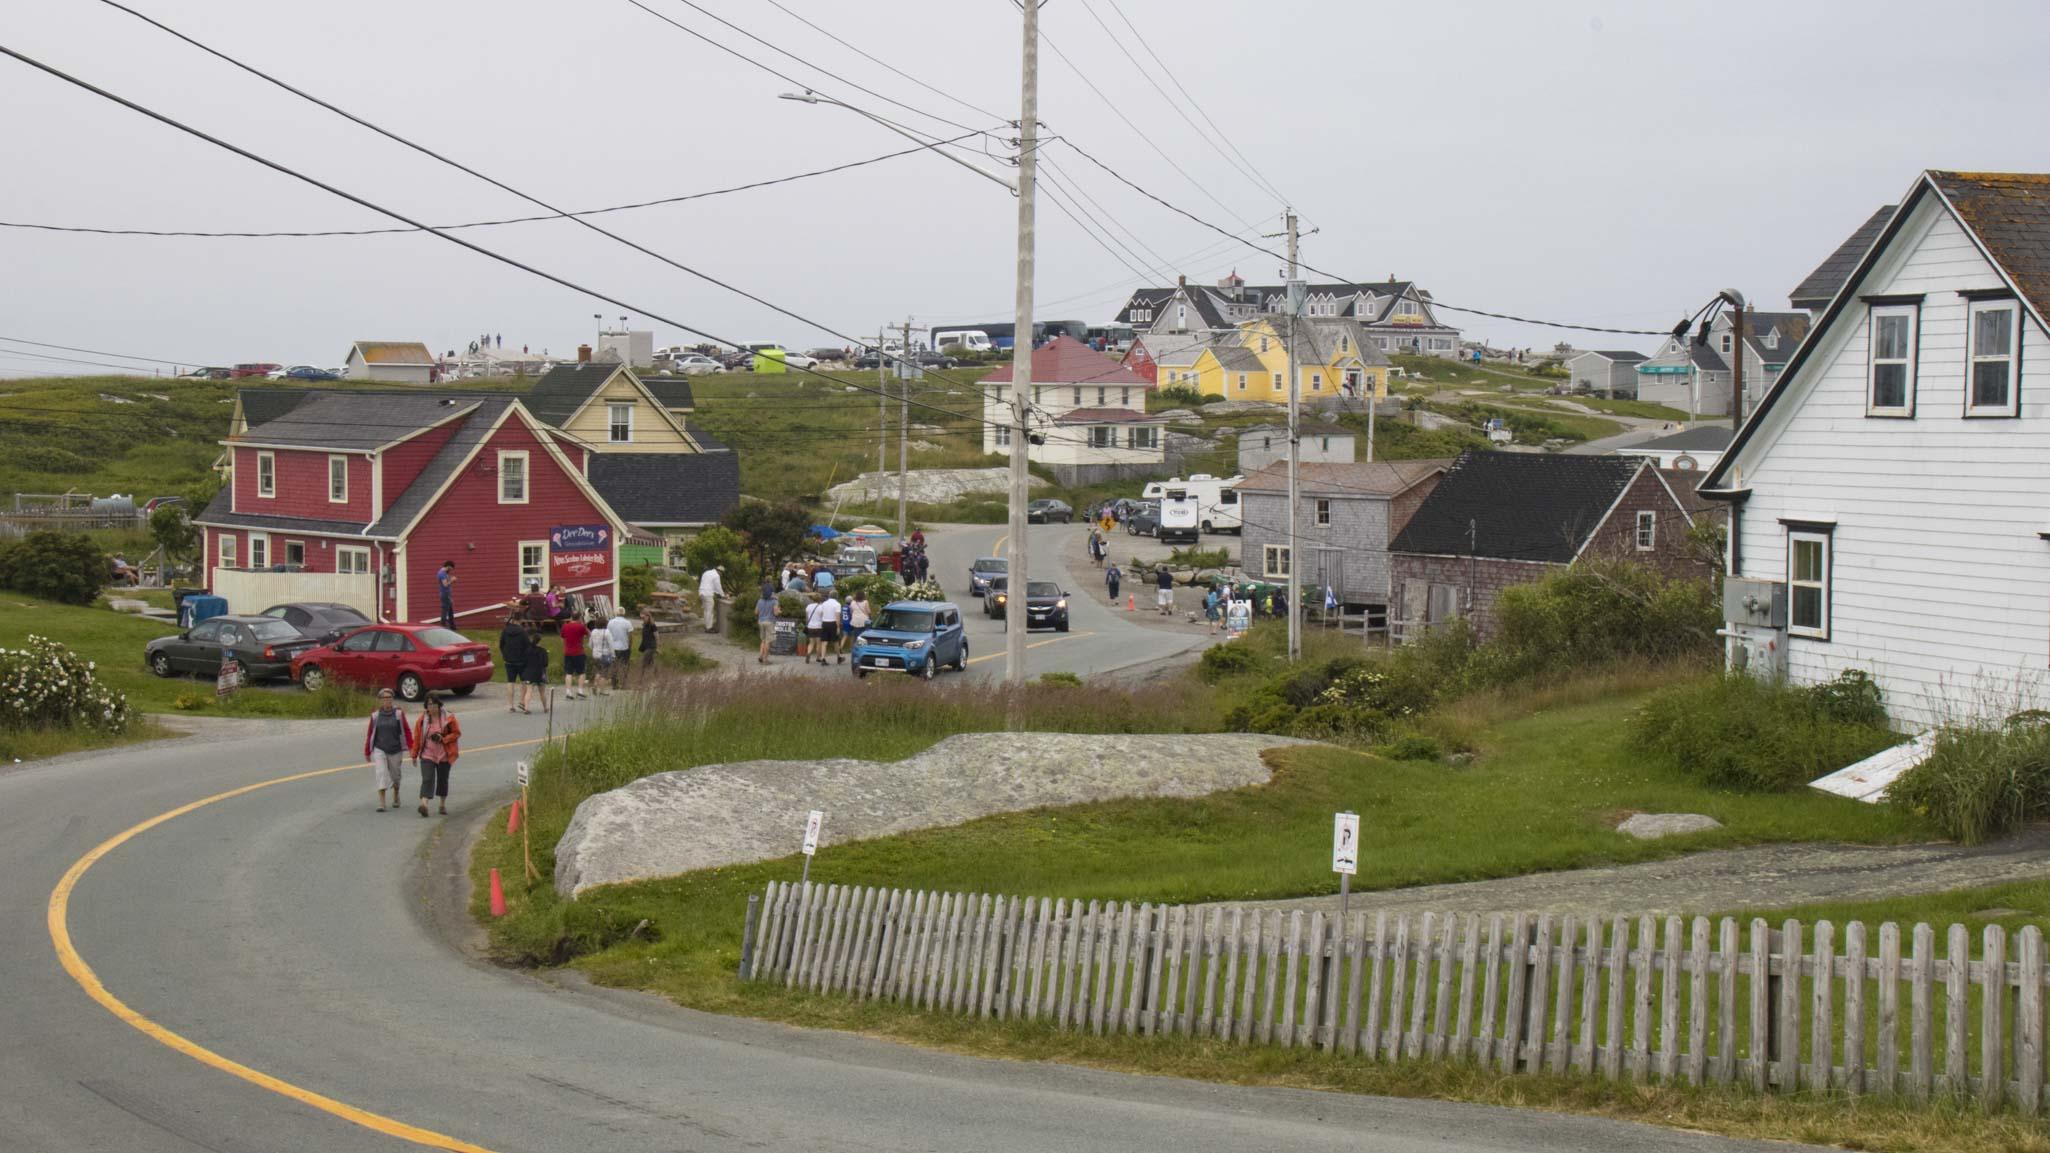 0718 Peggys Cove (1 of 1)